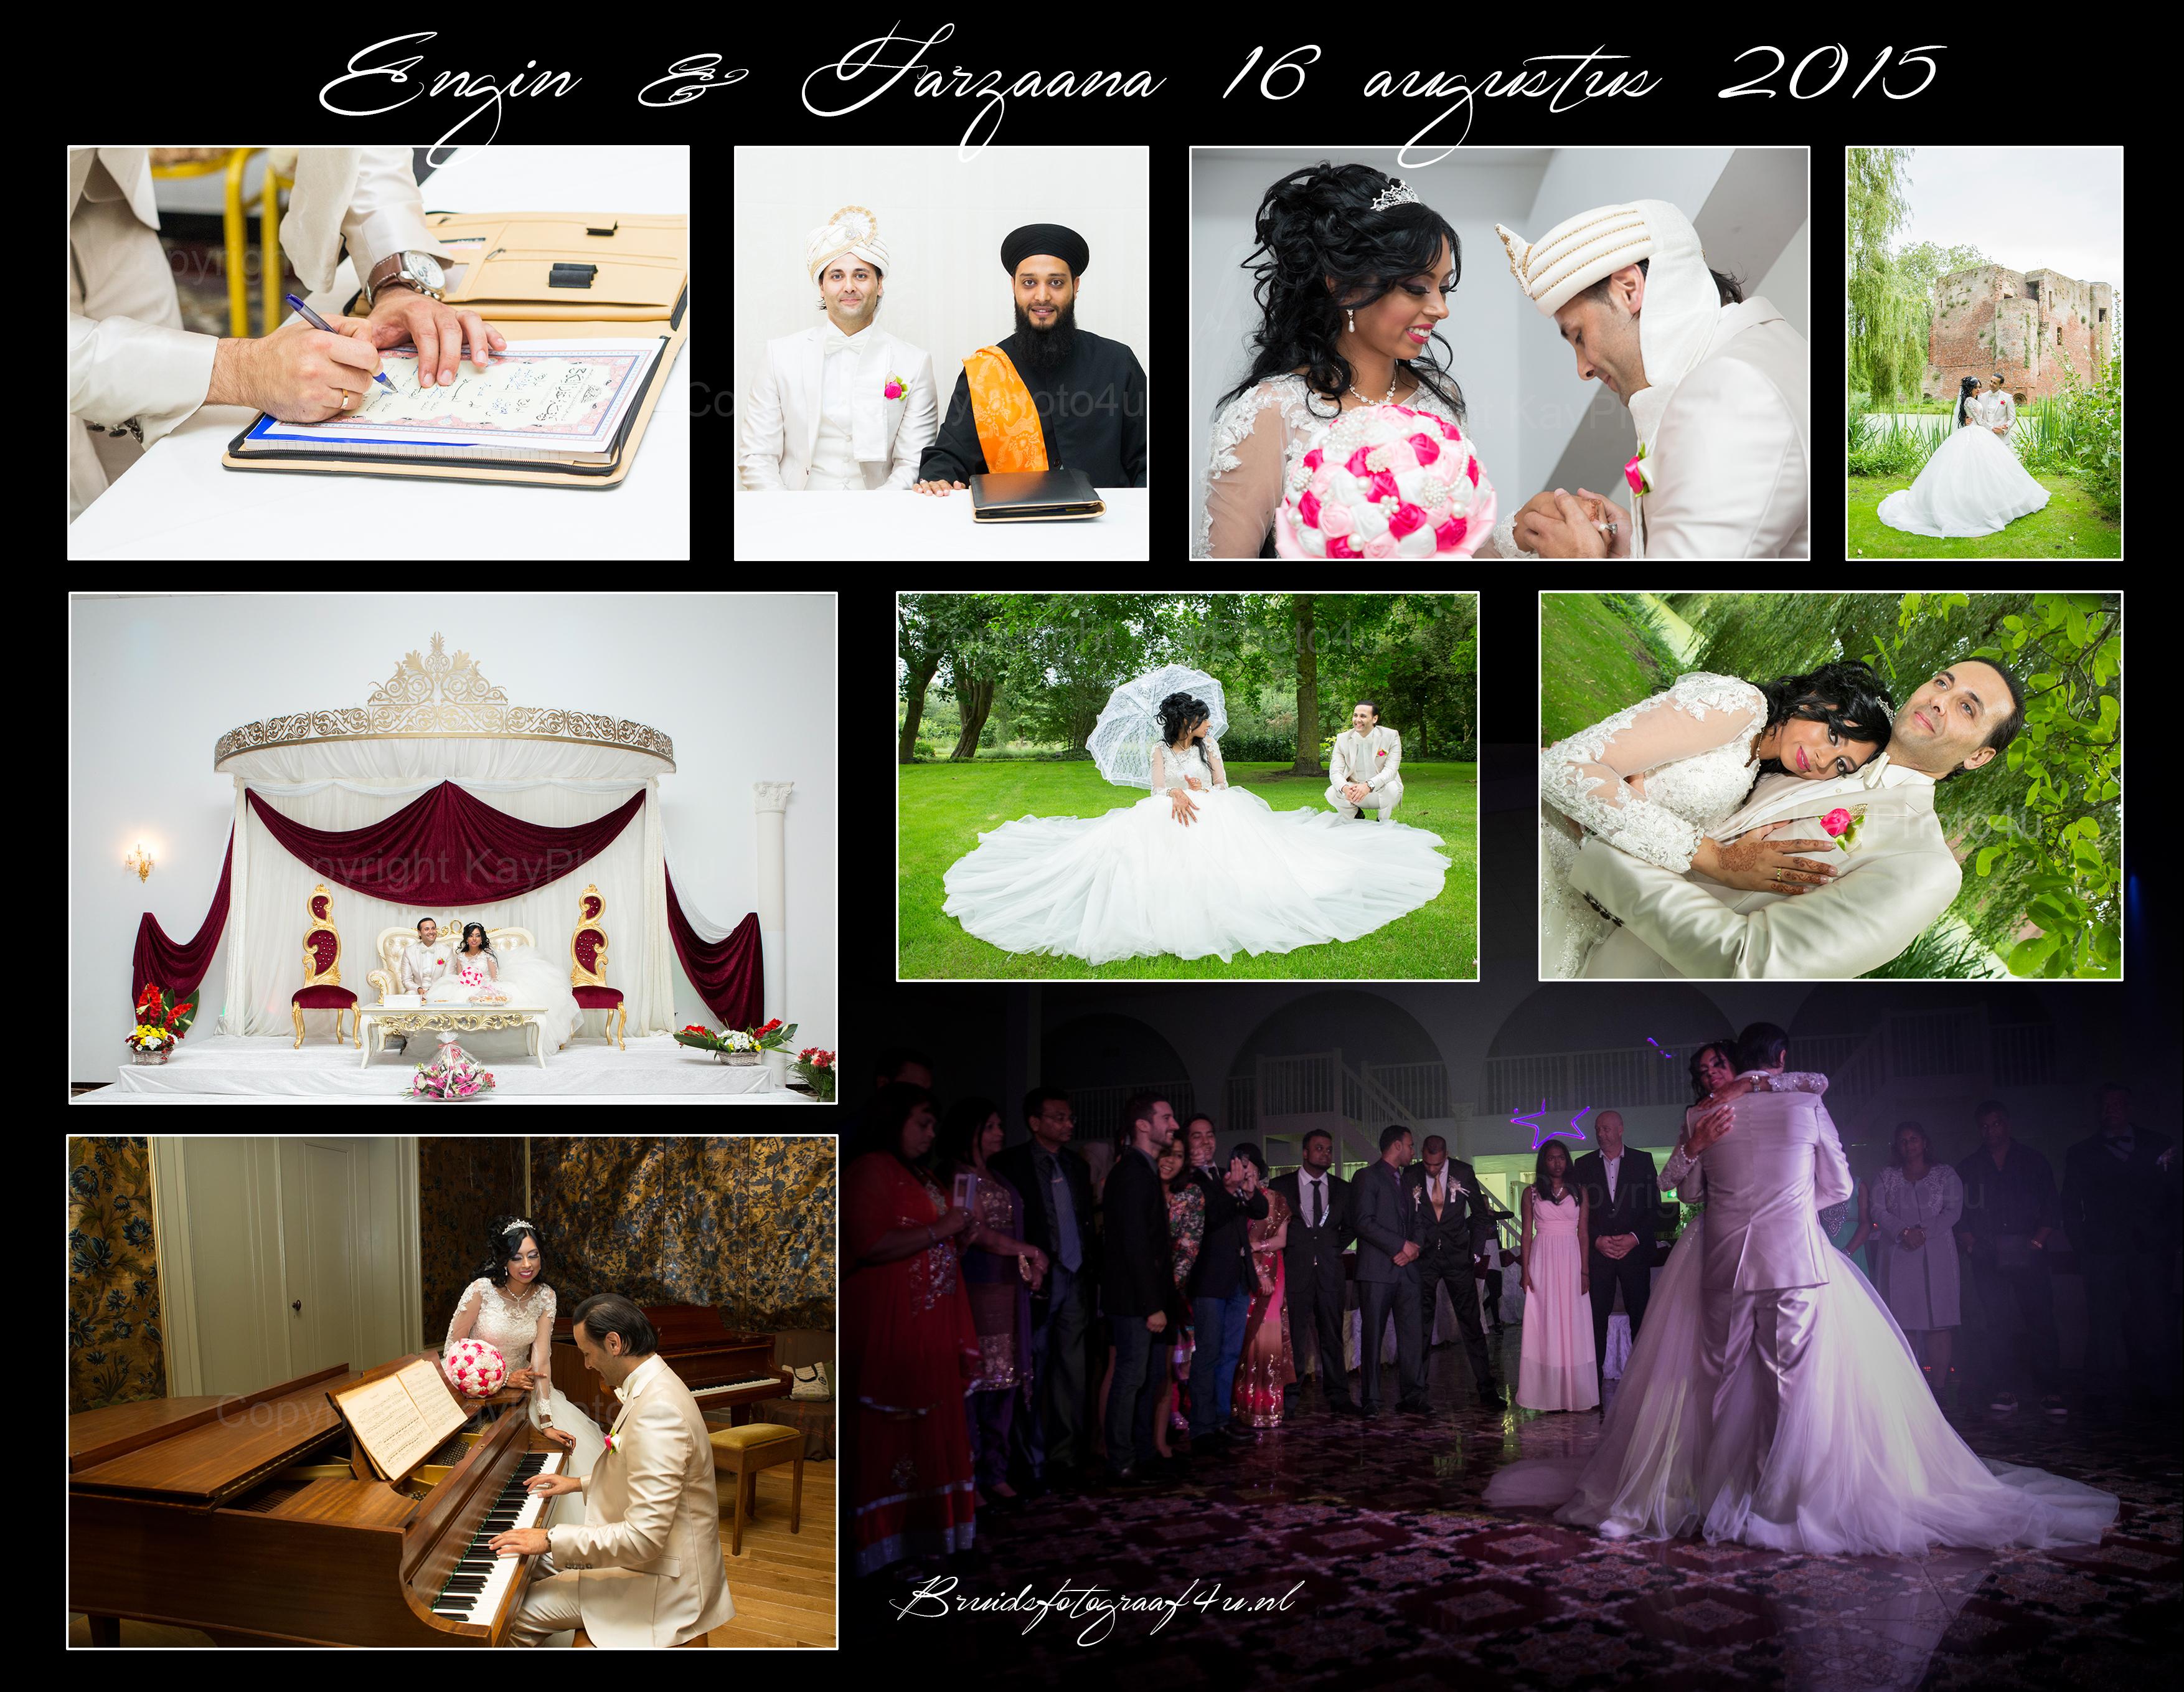 Bruidsreportage, Islamitische bruiloft, Kayphoto4u, bruidsfotograaf4u, Trouwfoto Amersfoort, bruidsreportage Vlaardingen, bruidsreportage Amersfoort, bruidsreportage Vathorst, Trouwfotograaf Amersfoort, Trouwfotograaf Rotterdam, Trouwen Rotterdam, fotograafofferte, fotograaf offerte, trouwfotograaf offerte, bruidsfotograaf offerte